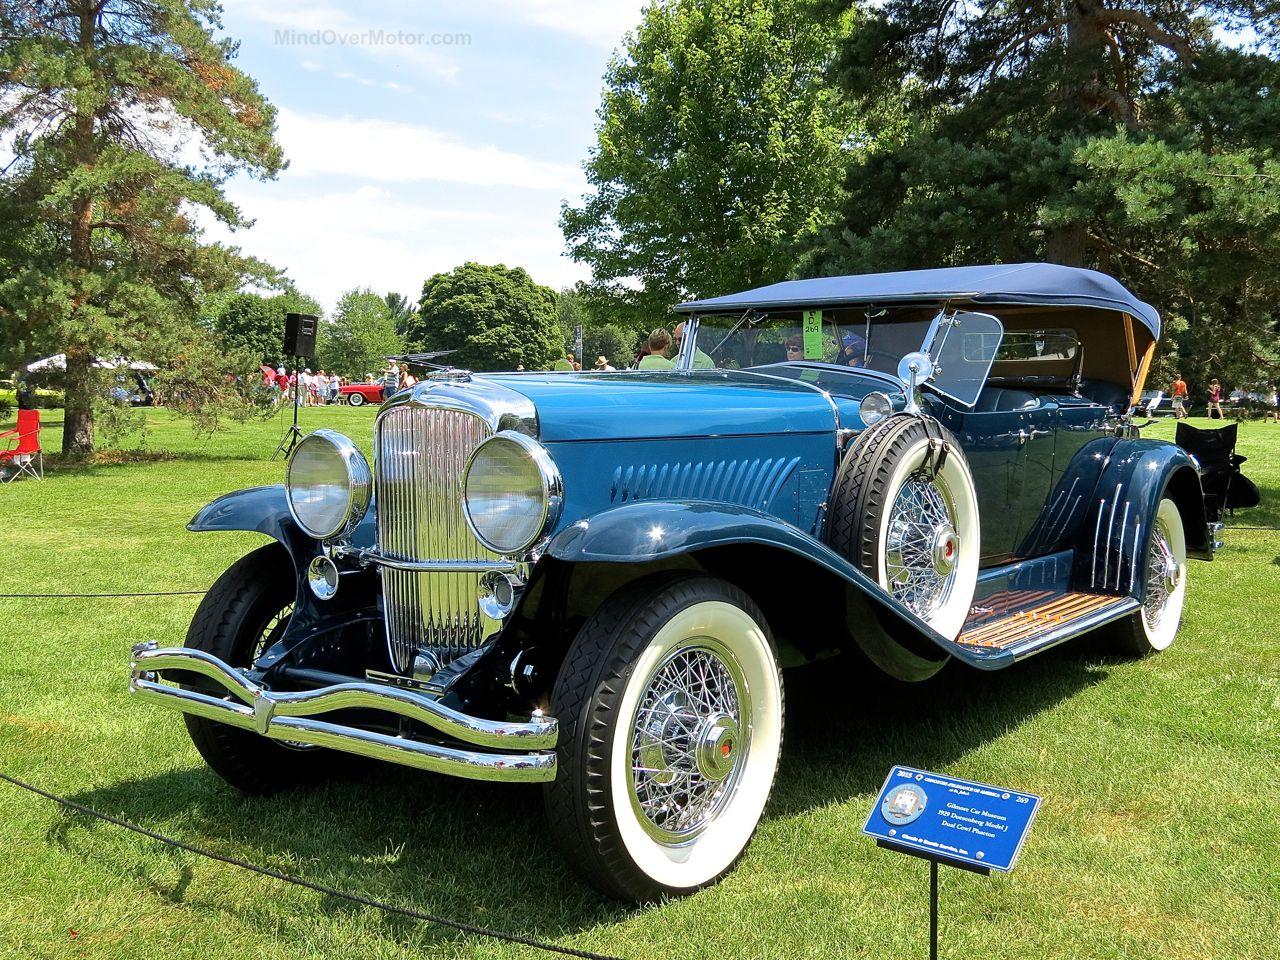 1929 Duesenberg Model J Concours of America